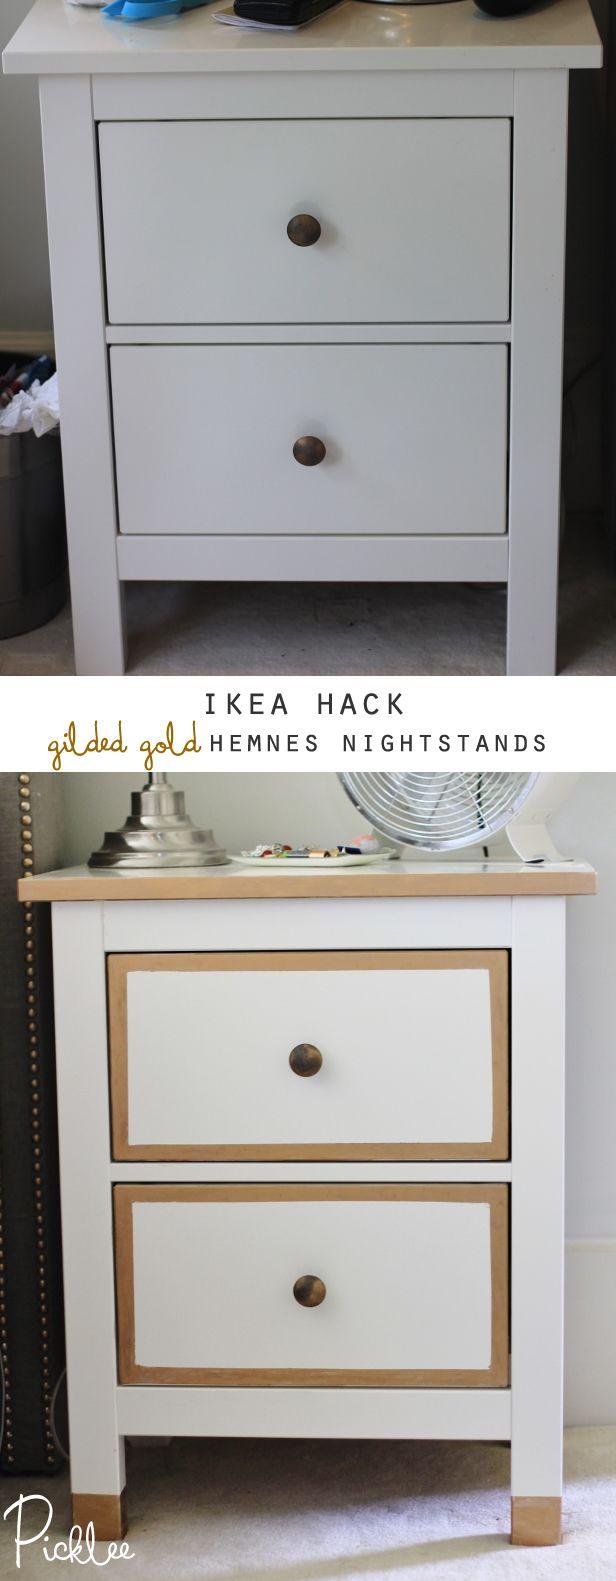 best 25 ikea hack nightstand ideas on pinterest ikea 3. Black Bedroom Furniture Sets. Home Design Ideas